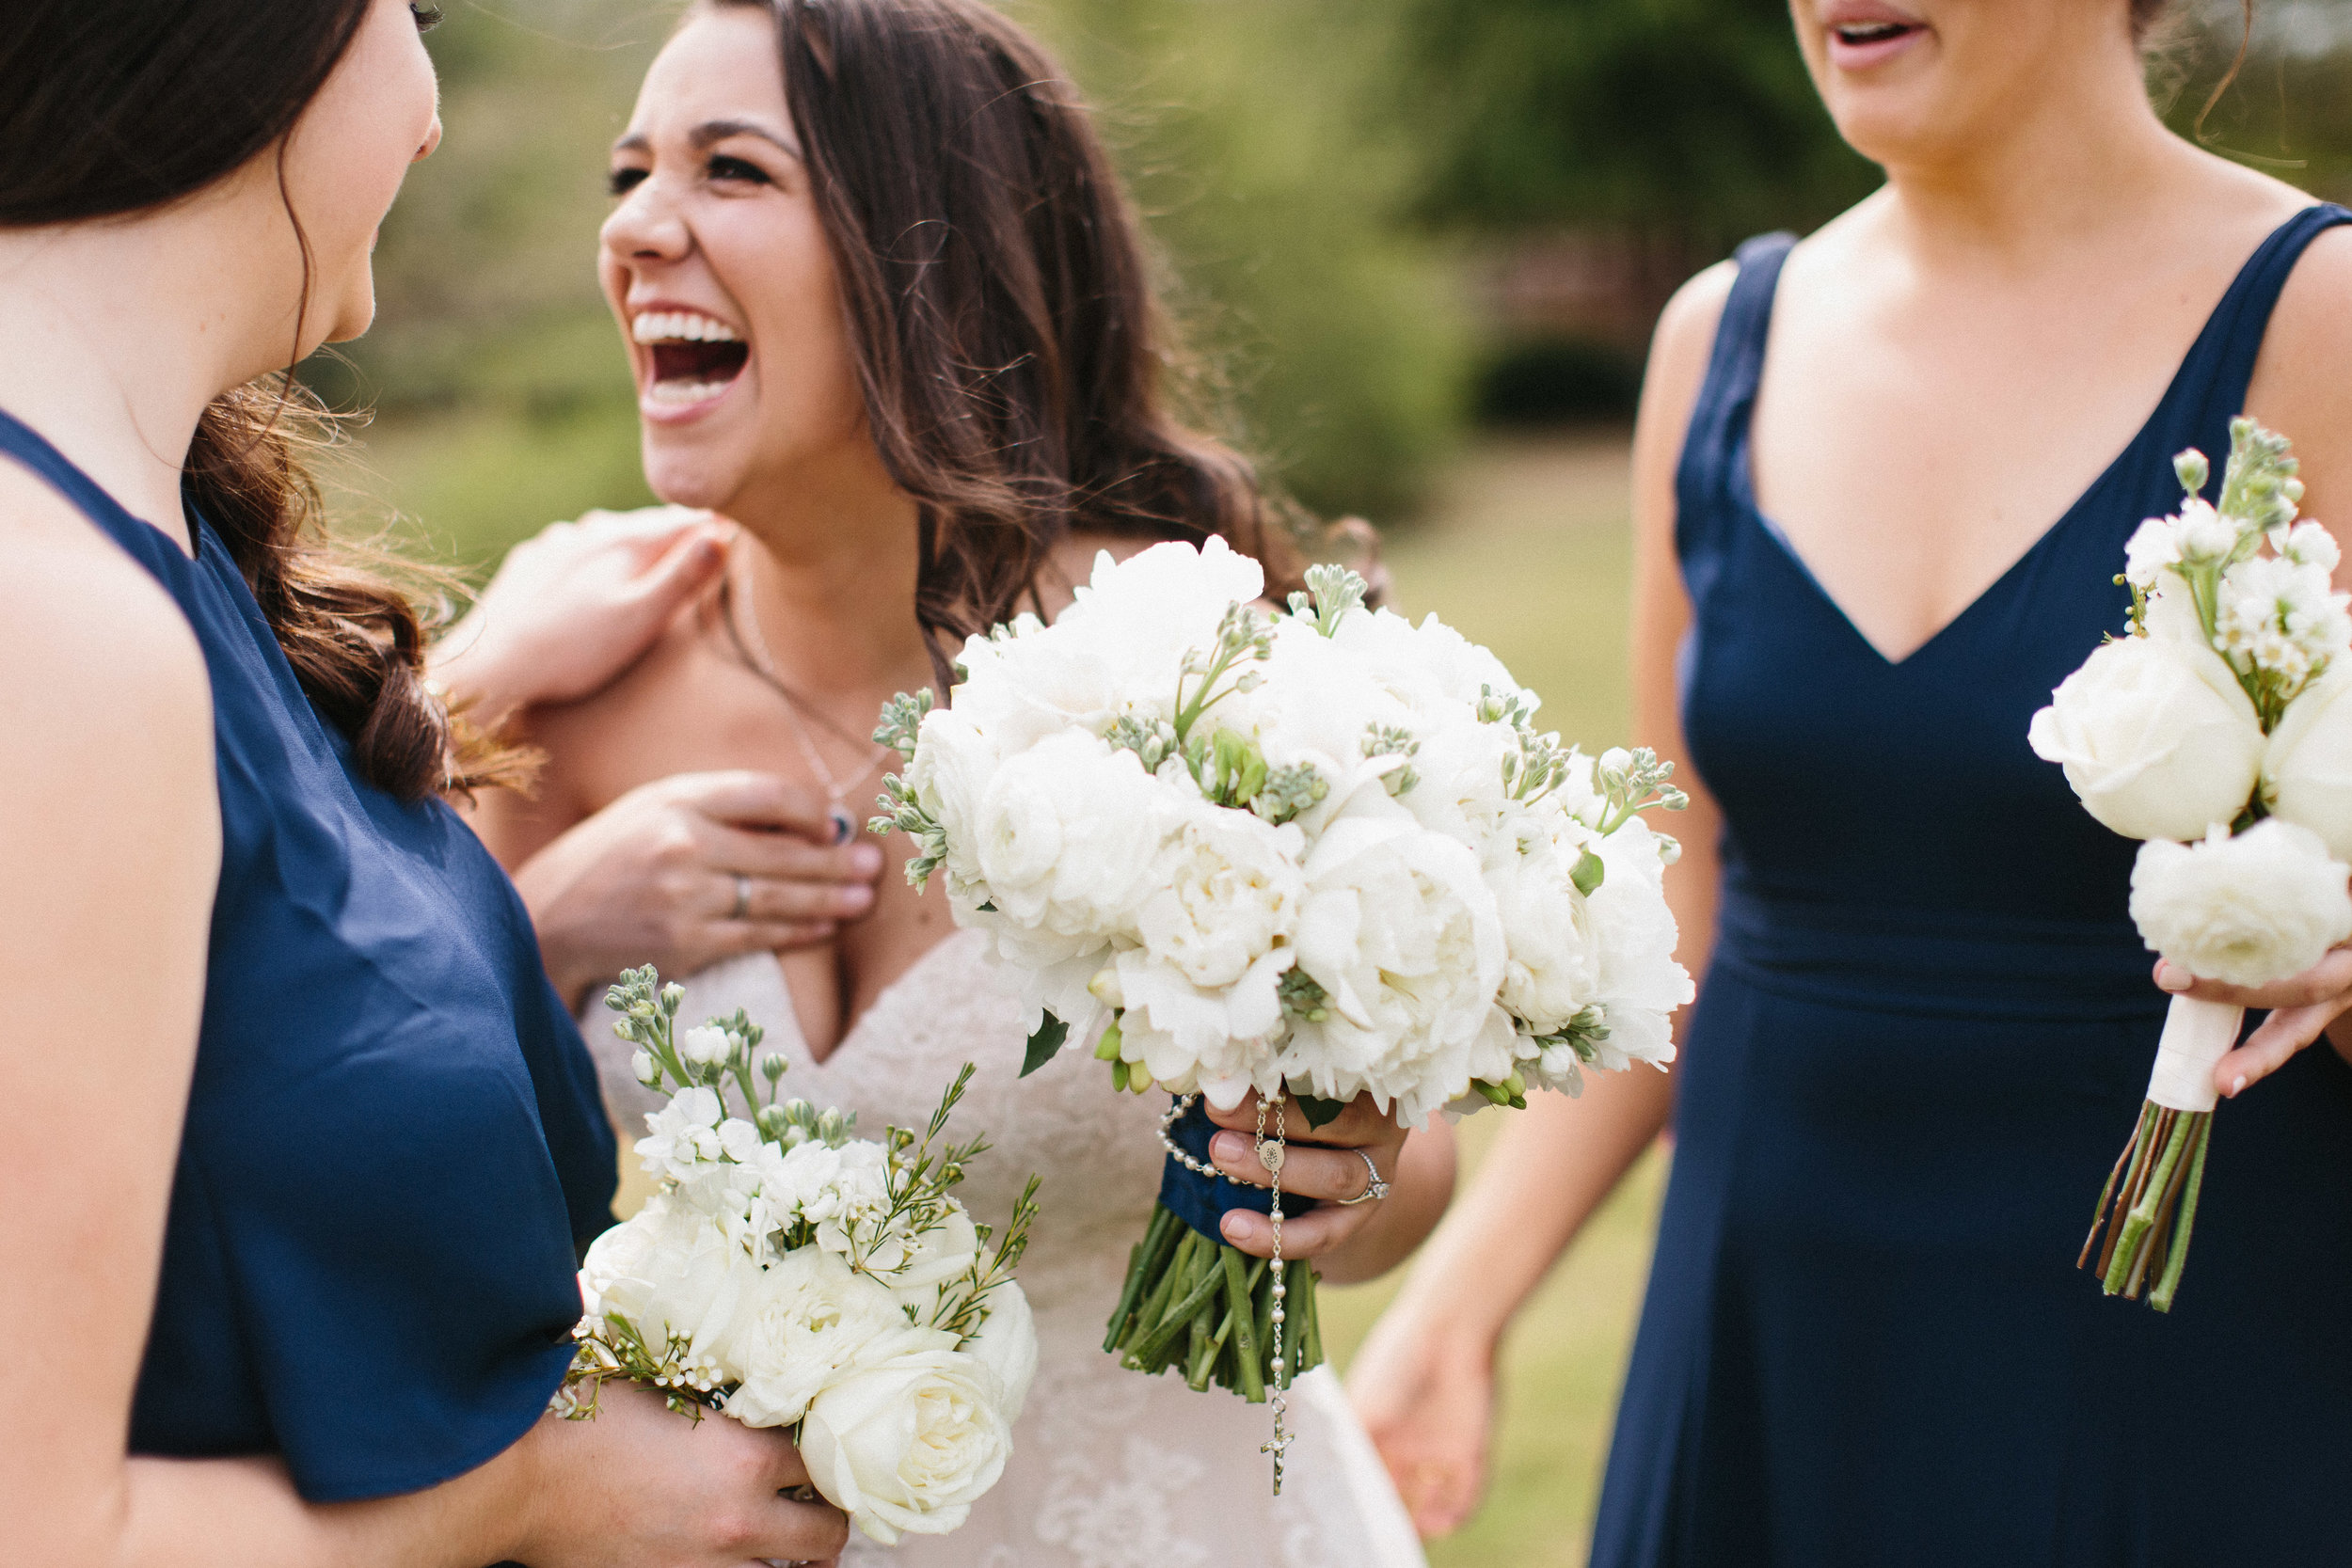 roswell_st_peter_chanel_catholic_avalon_hotel_alpharetta_wedding-1684.jpg